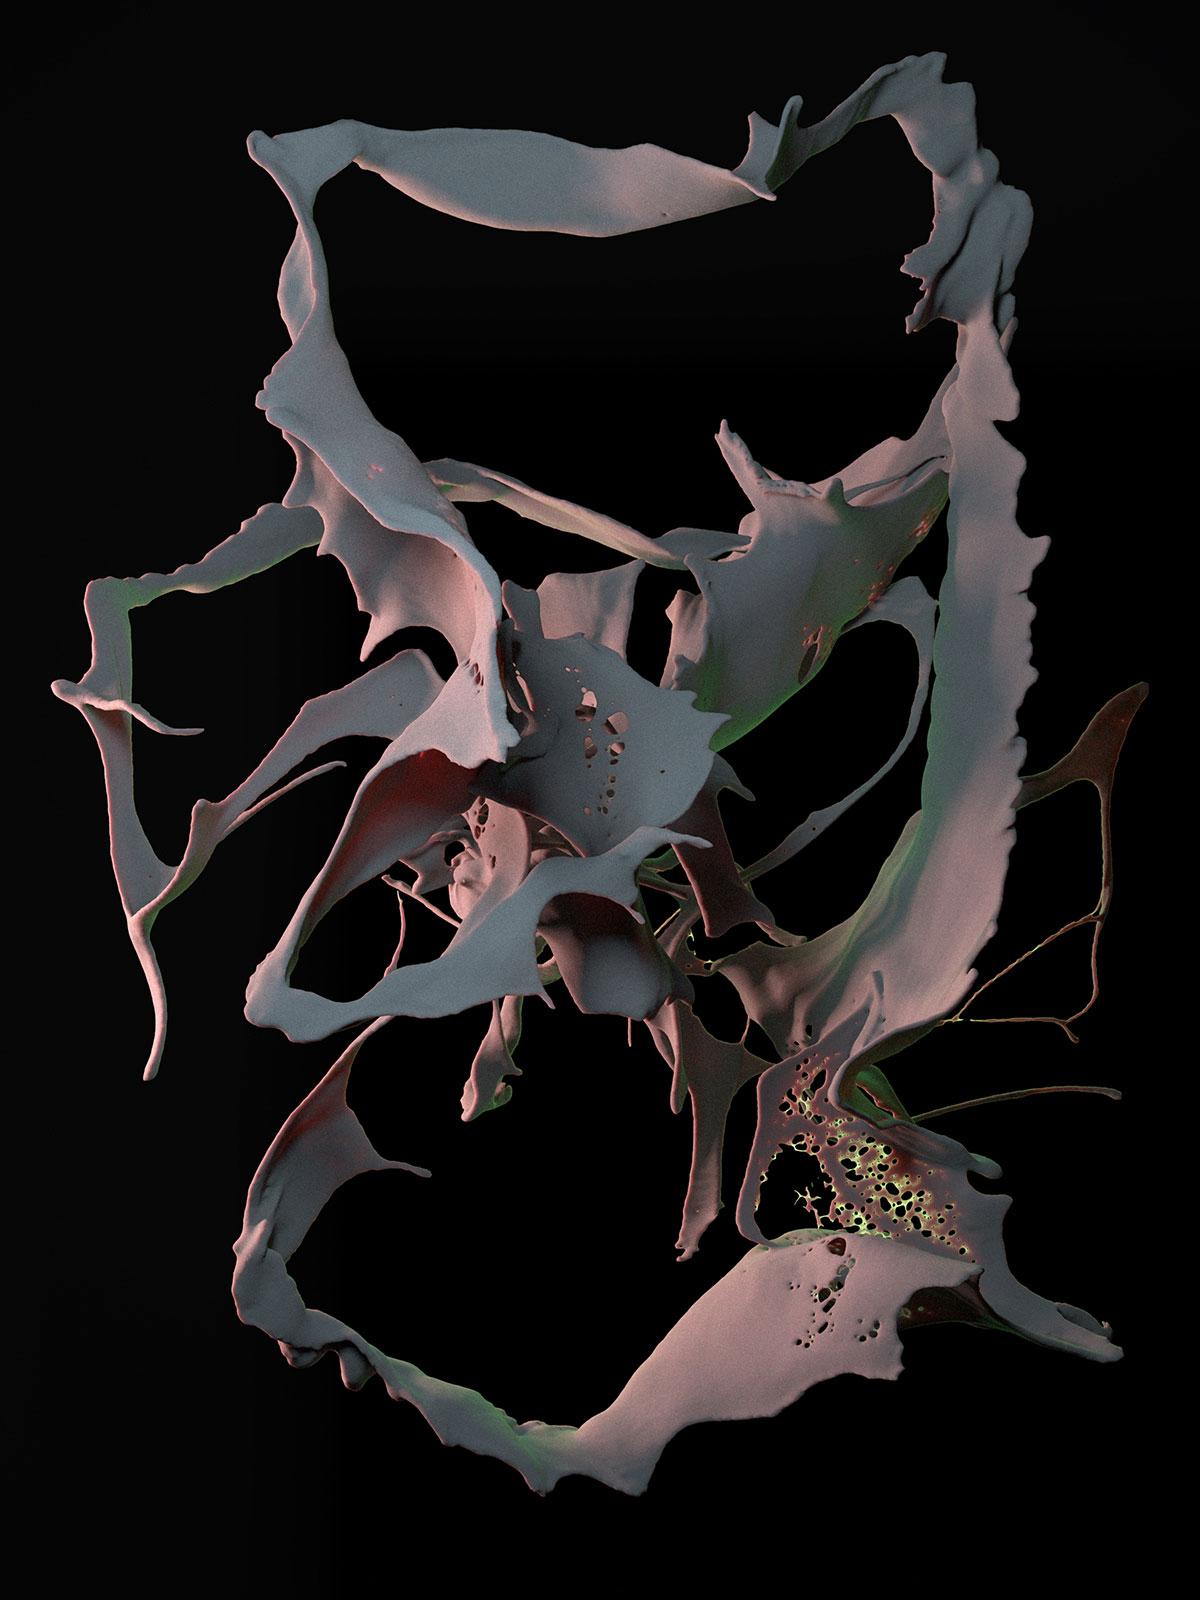 Postpainting II 04, CGI Fine Art Print, 155 x 118 cm, 2013